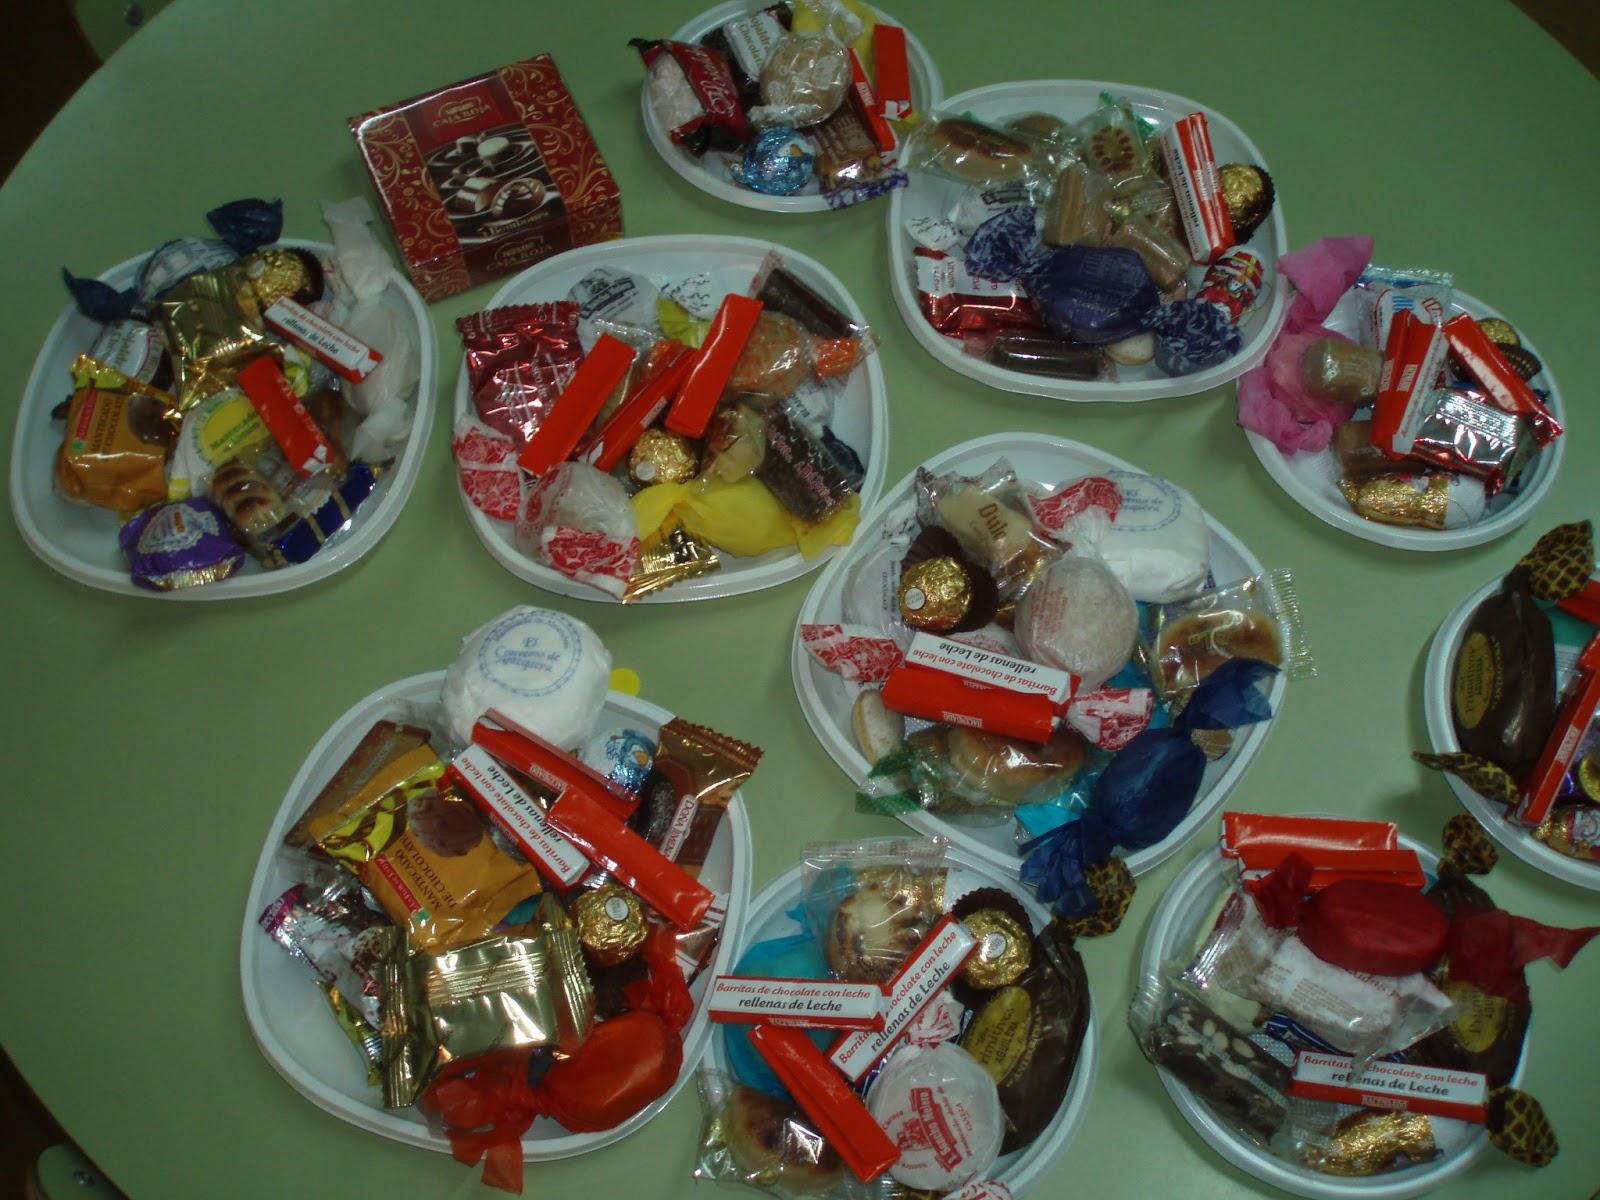 Arias montano infantil fiesta con dulces navide os for Platos dulces